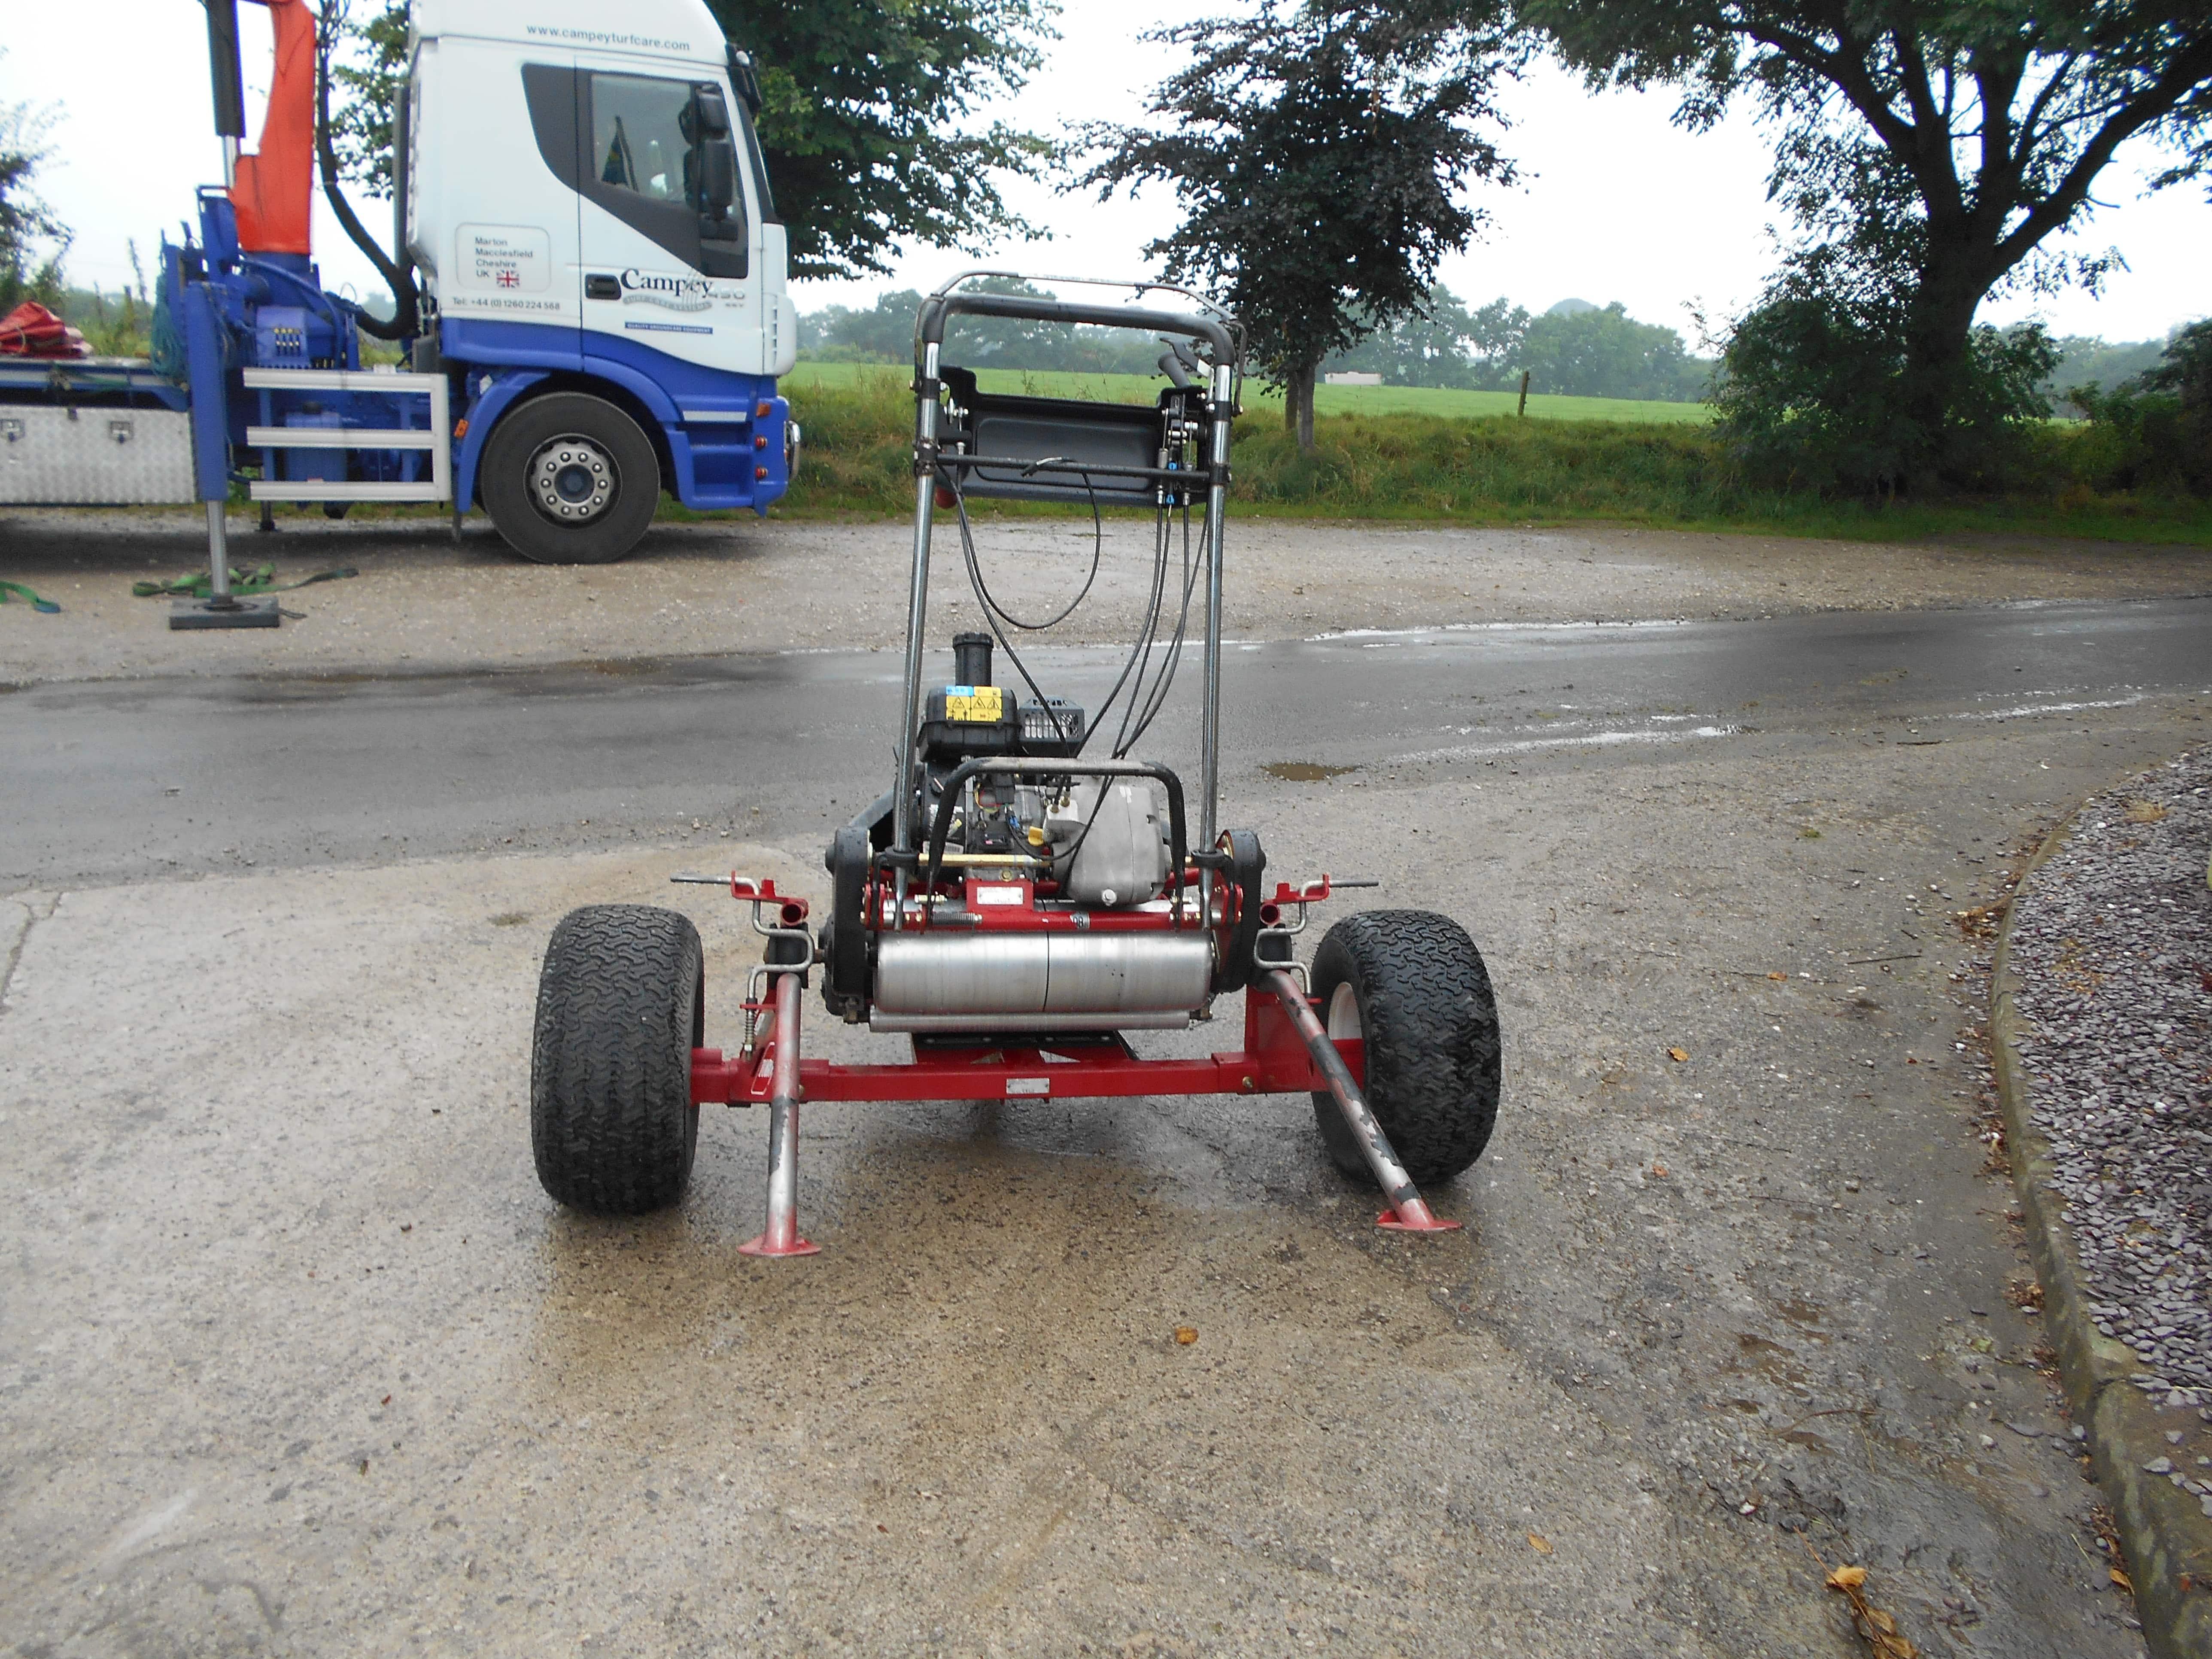 Toro Greenmaster Flex 21 Mower - U3739/U3740